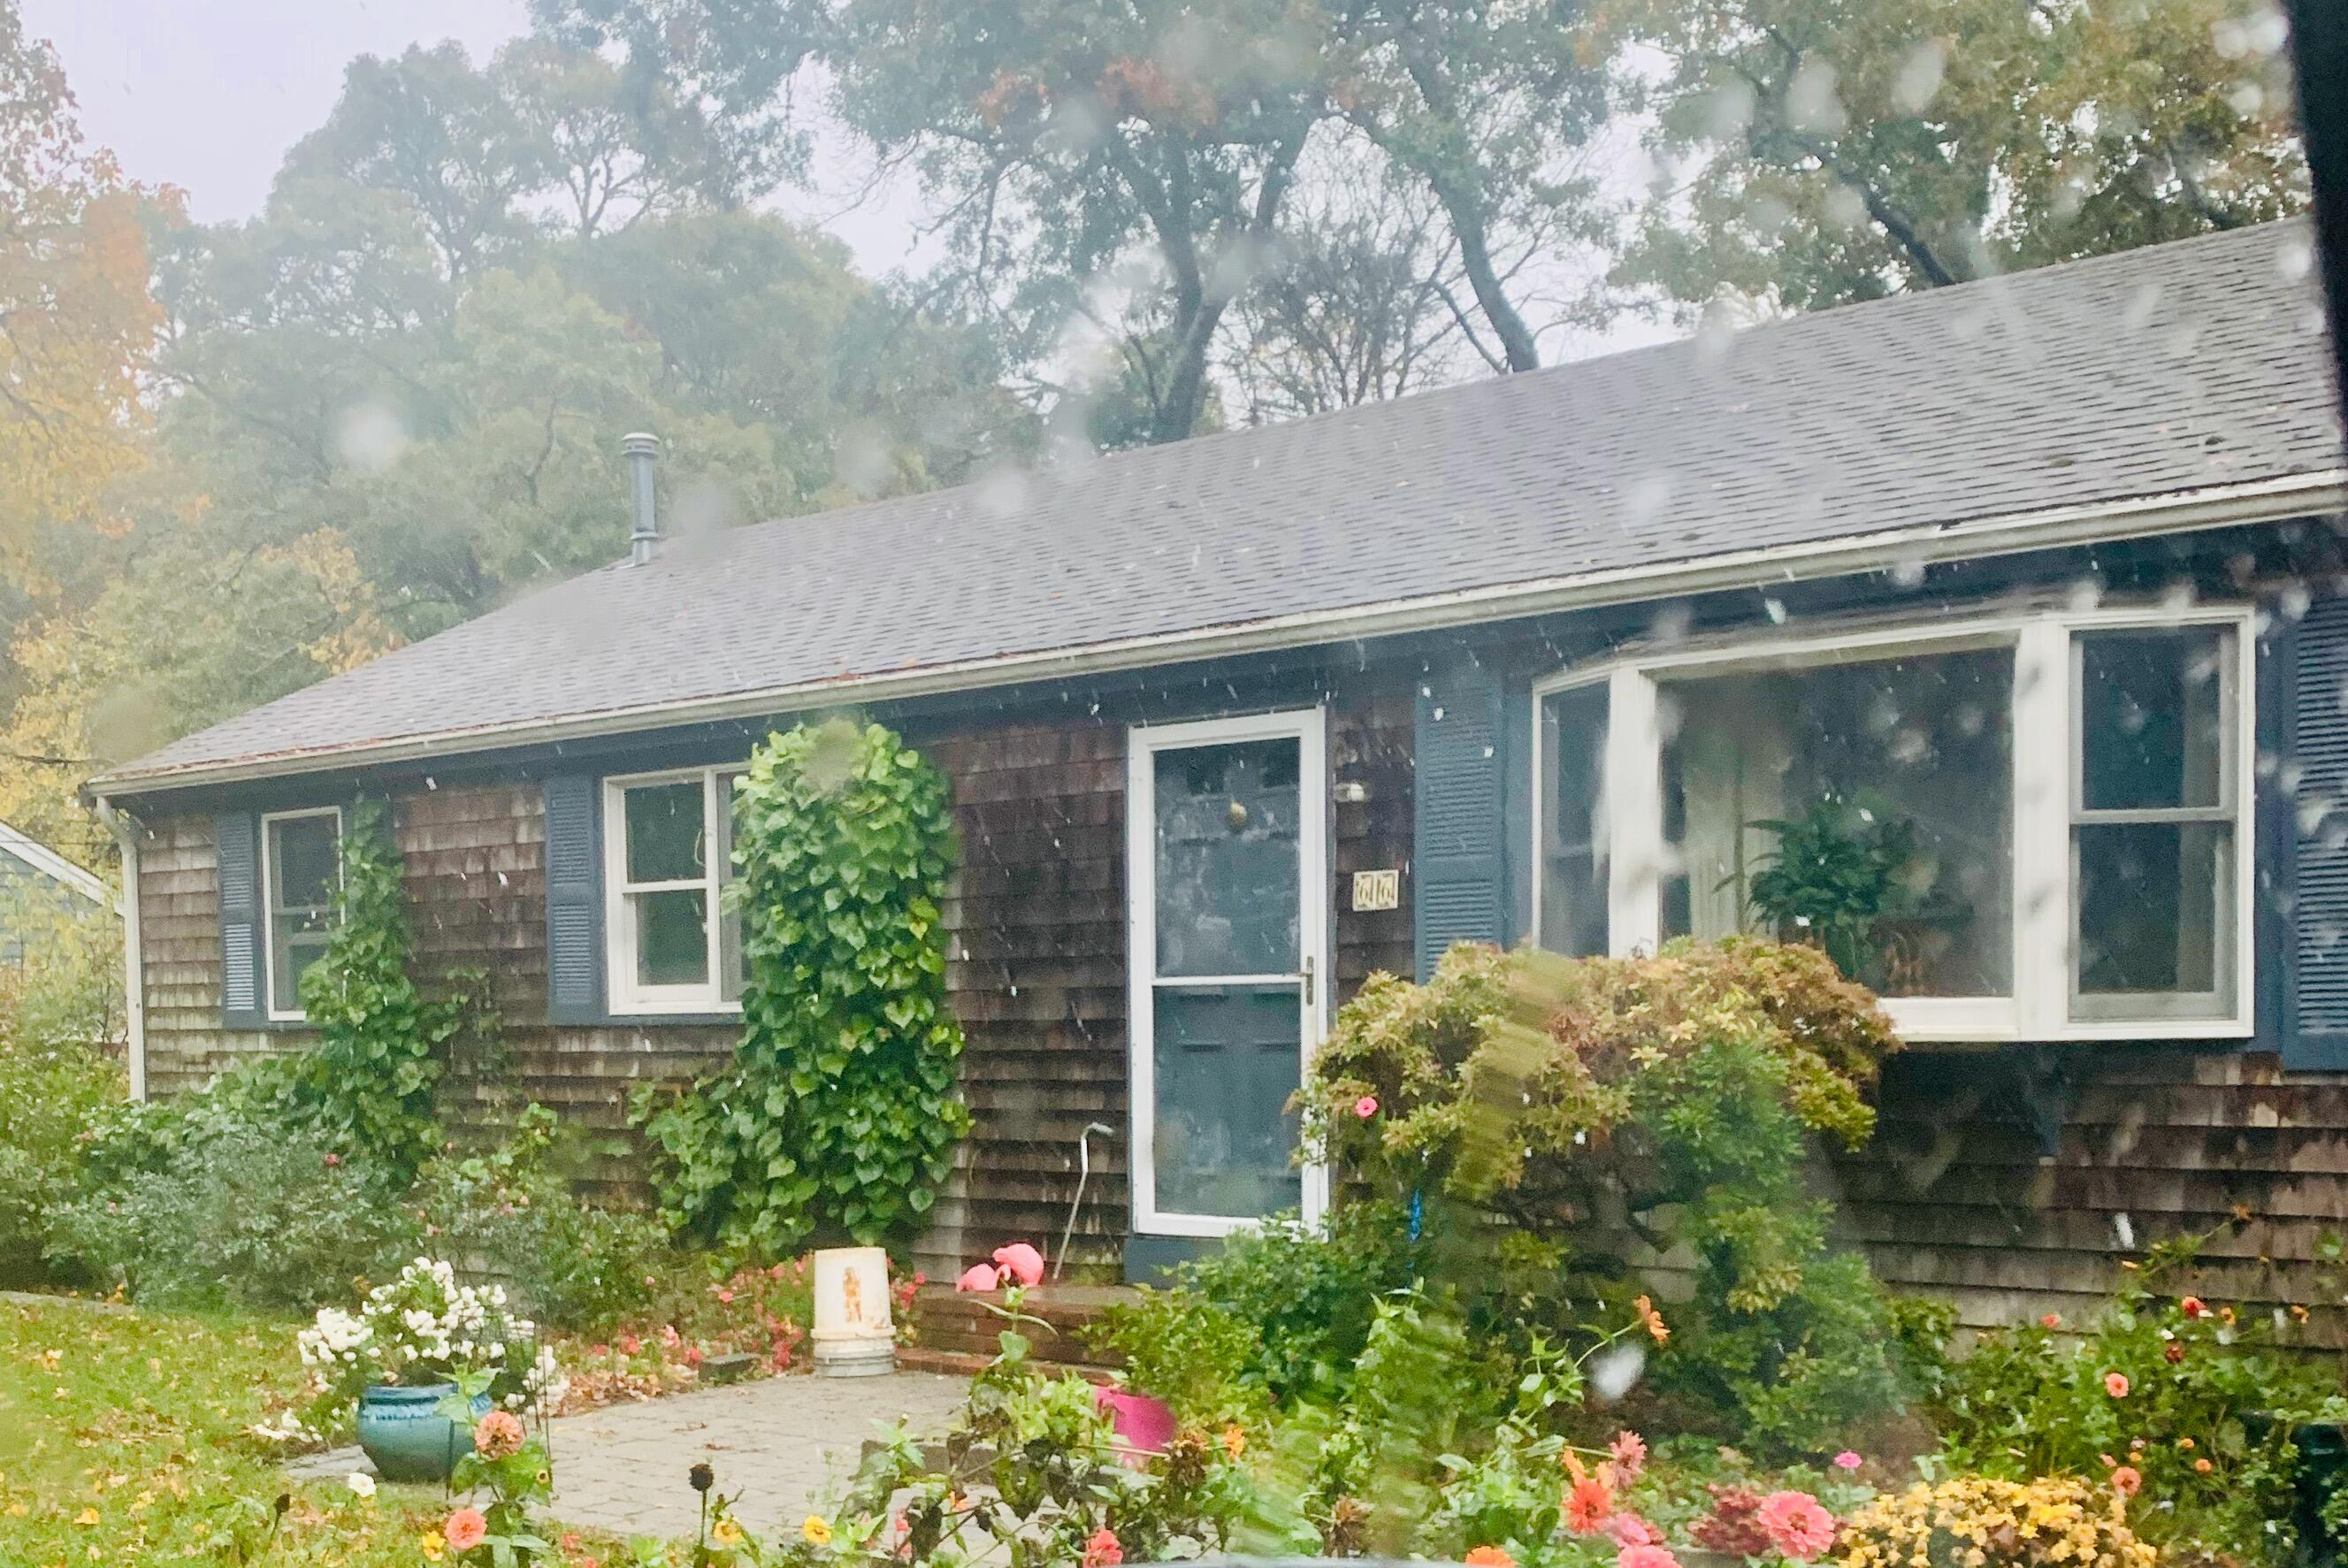 66 Lake Shore Drive, East Falmouth MA, 02536 details